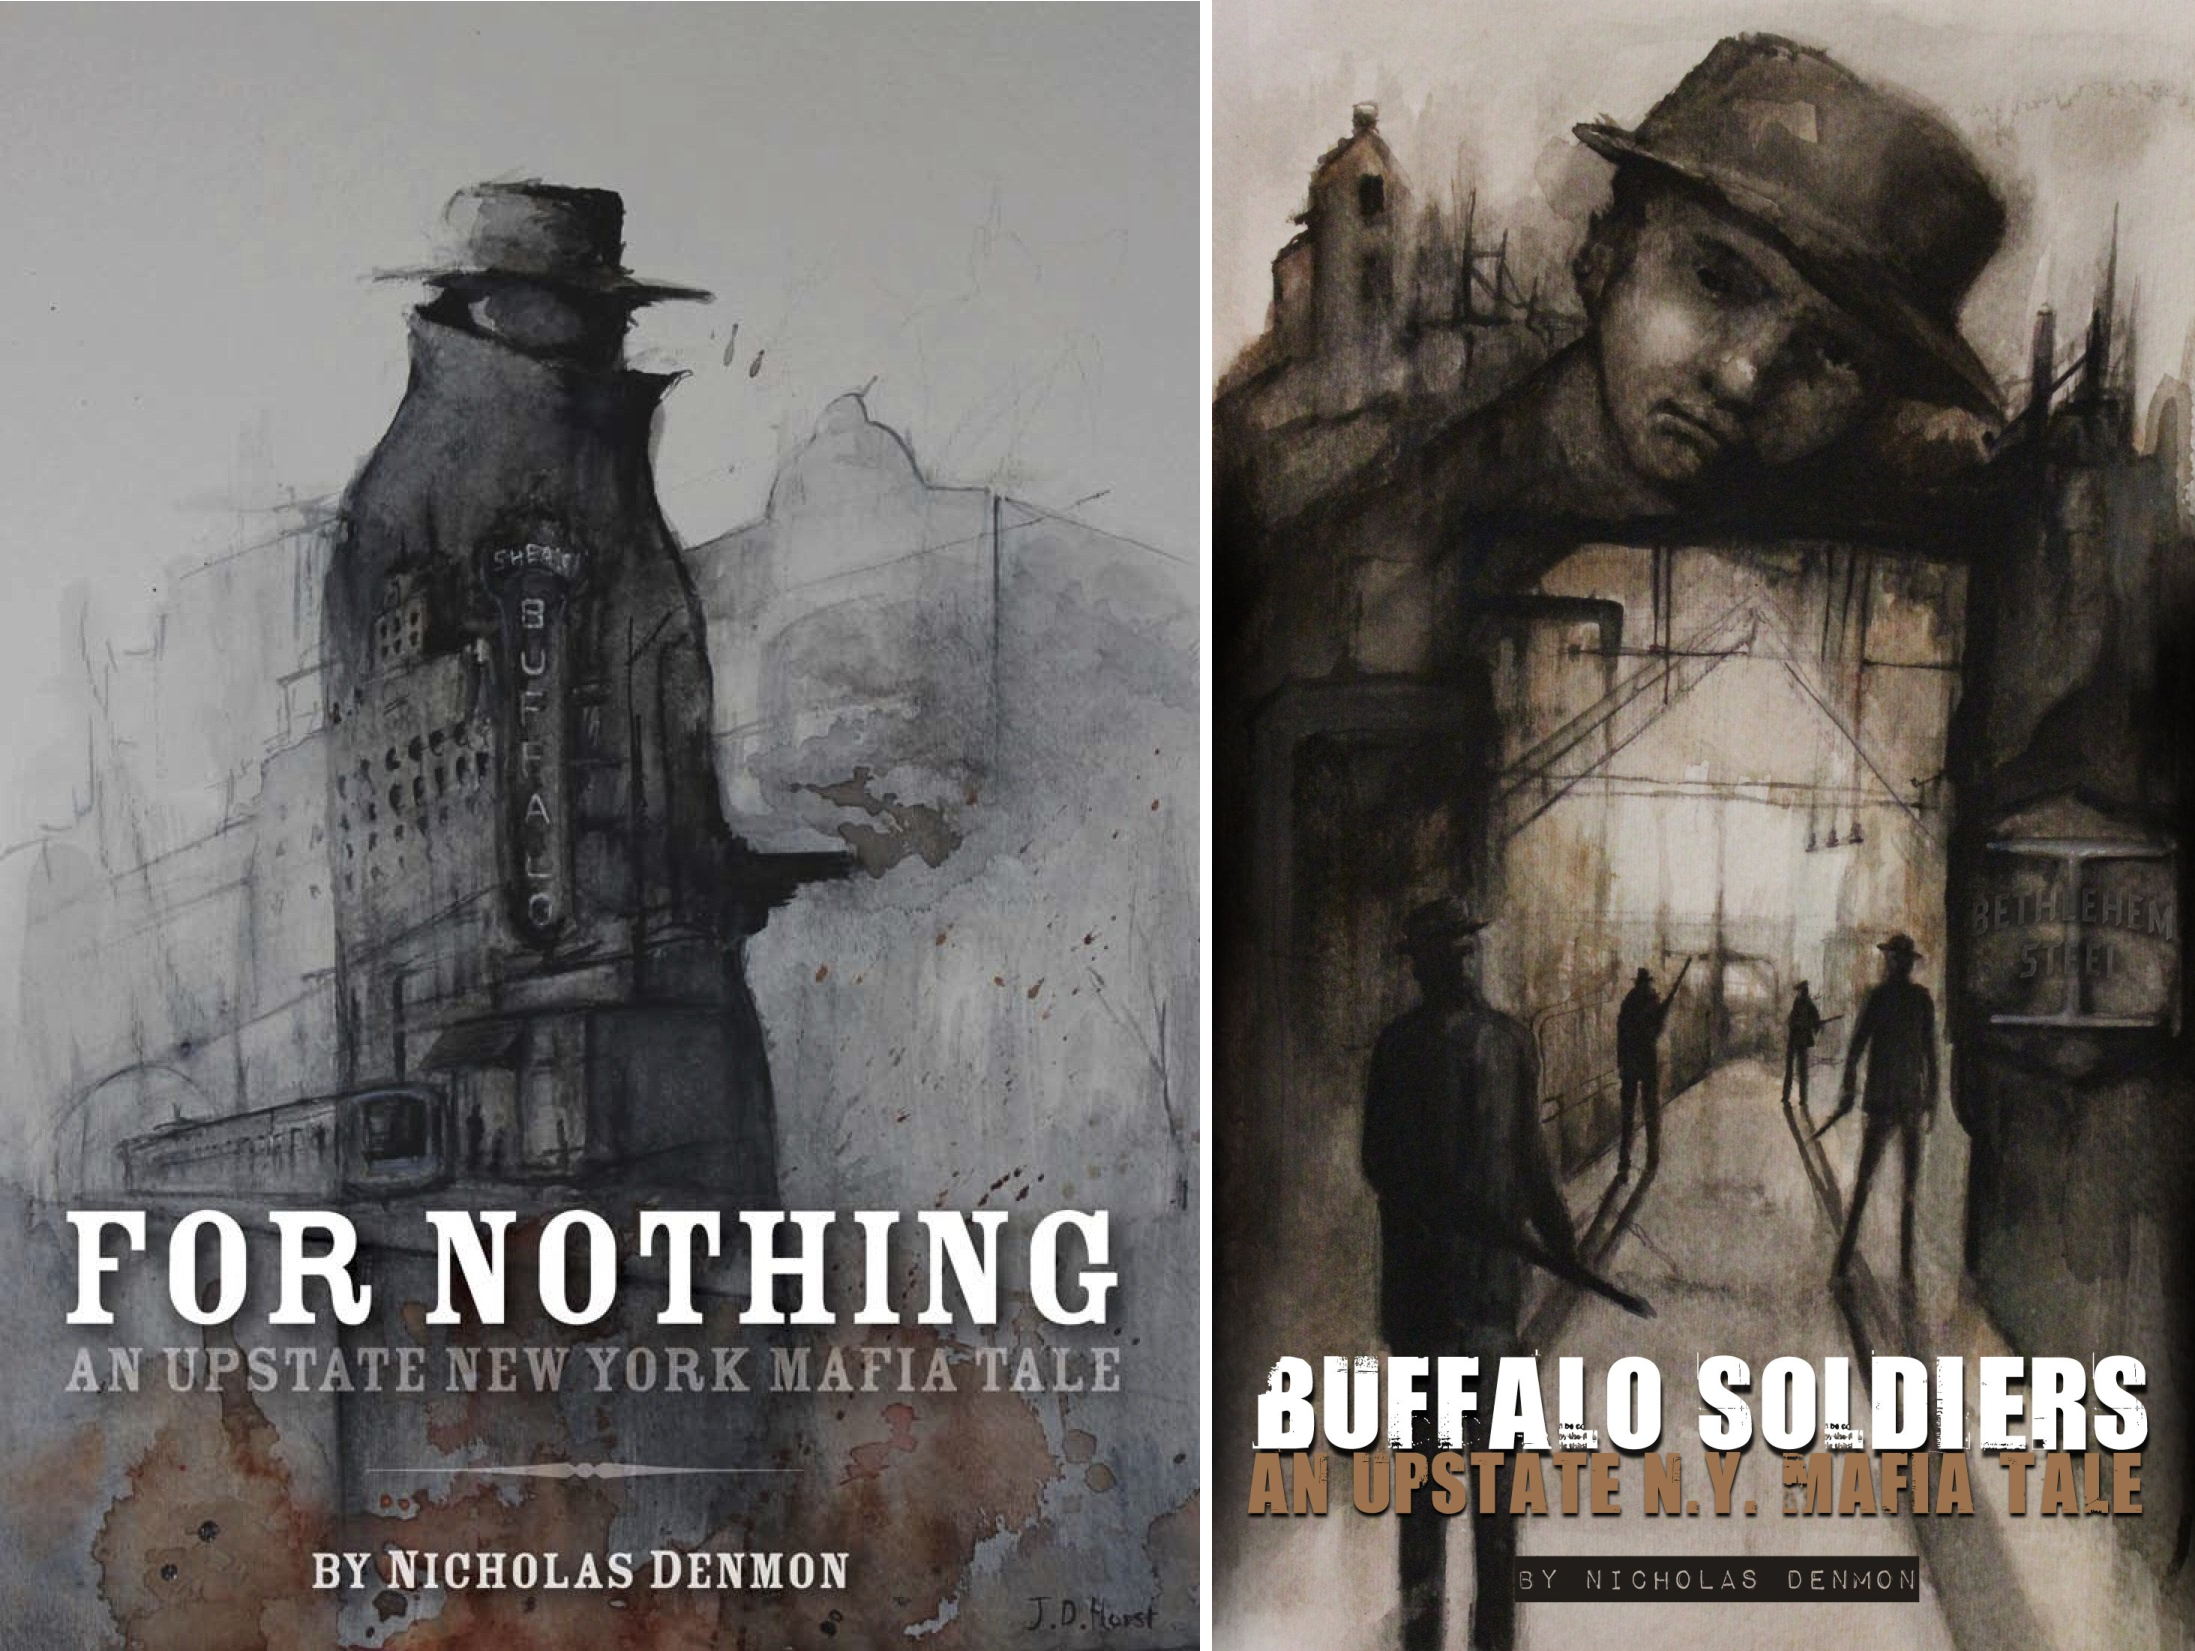 An Upstate New York Mafia Tale (2 Book Series)